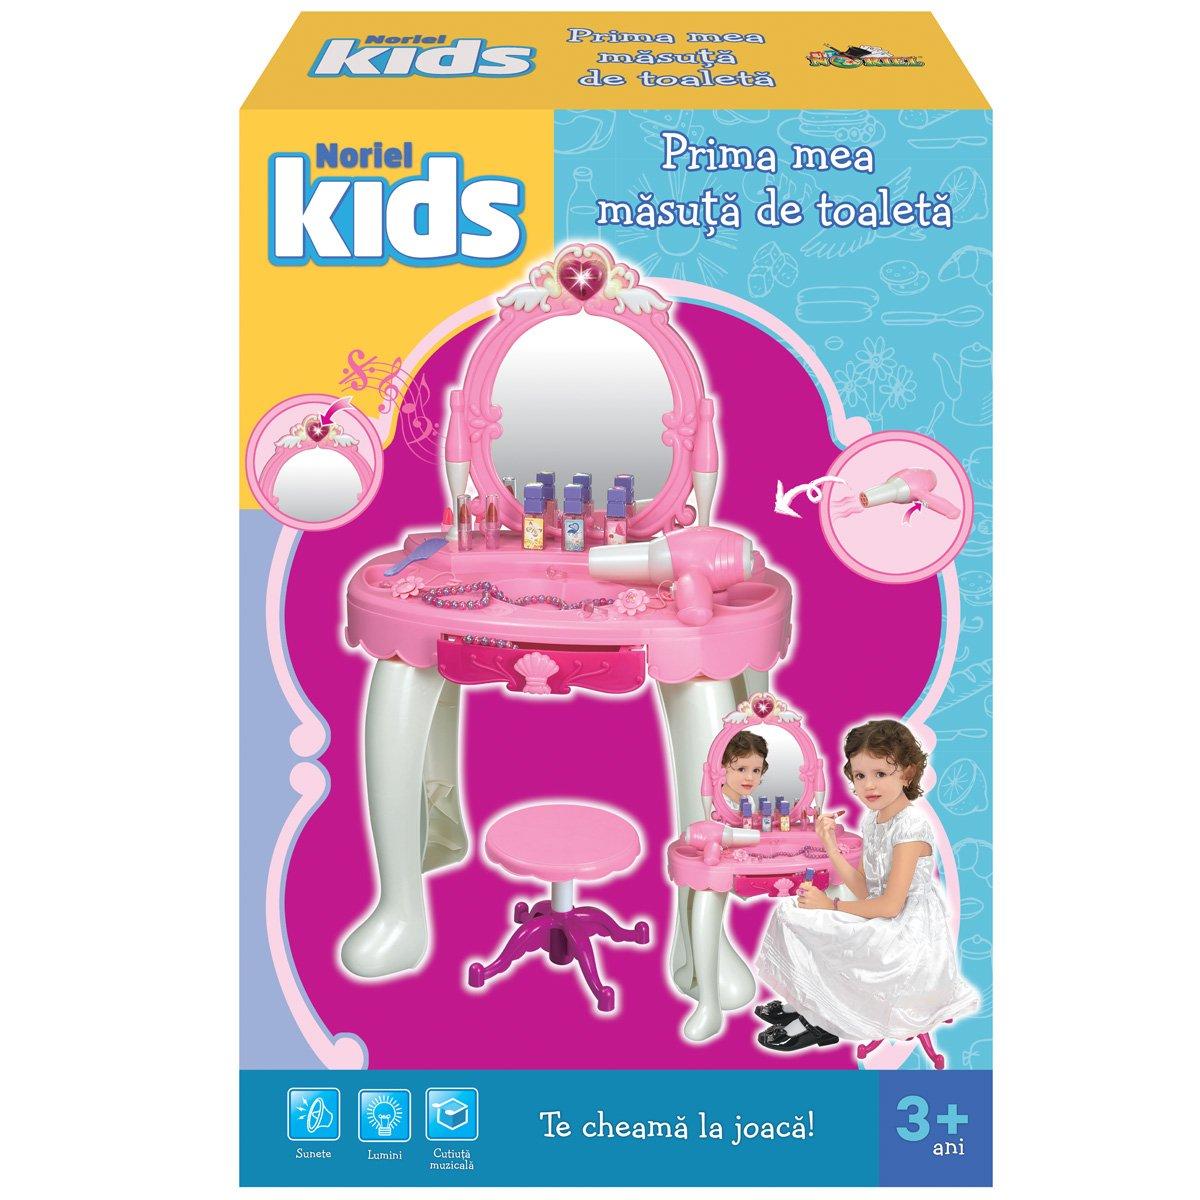 Set de joaca, Noriel Kids, Prima mea masuta de toaleta